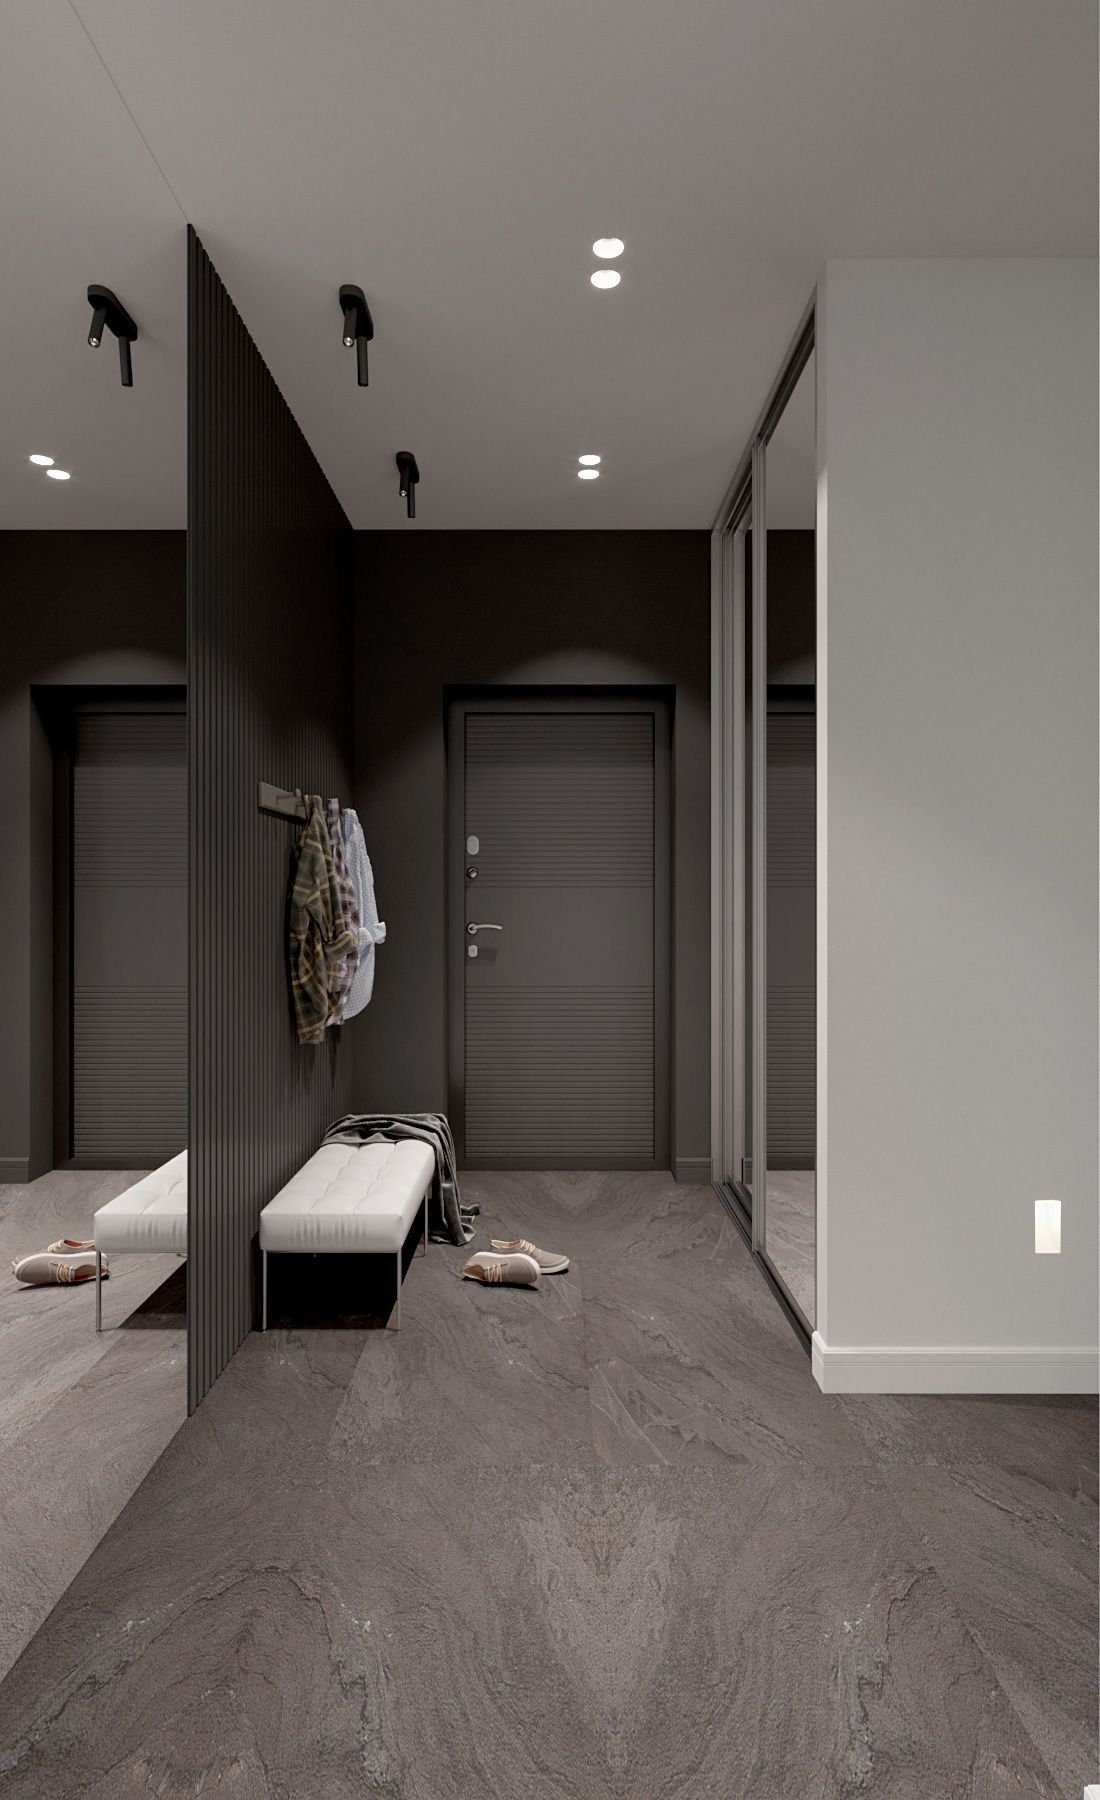 Apartment in dark tones on Behance  Apartment entrance, Hallway